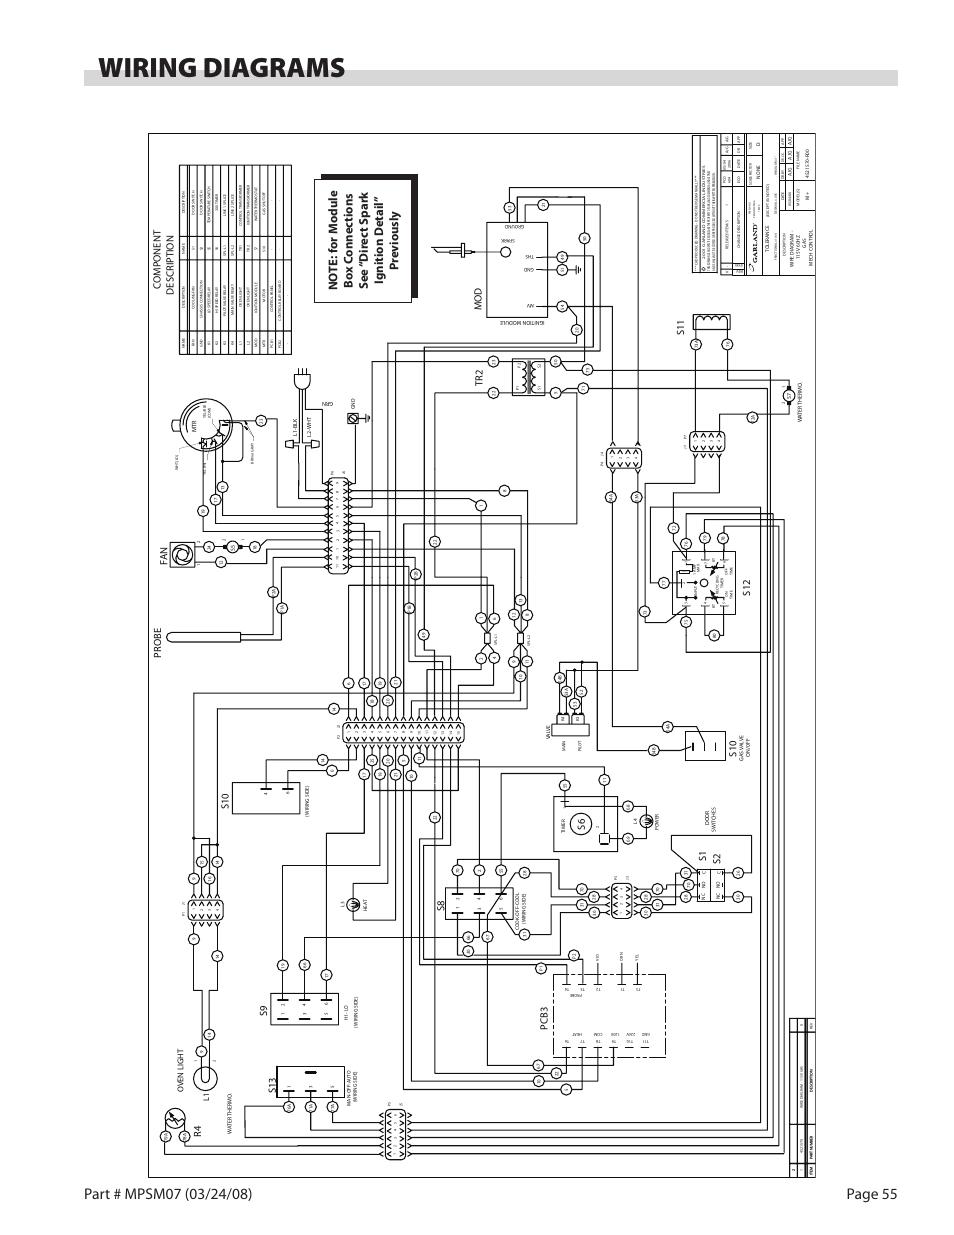 Siemens Len00c003120b Wiring Diagram : 36 Wiring Diagram